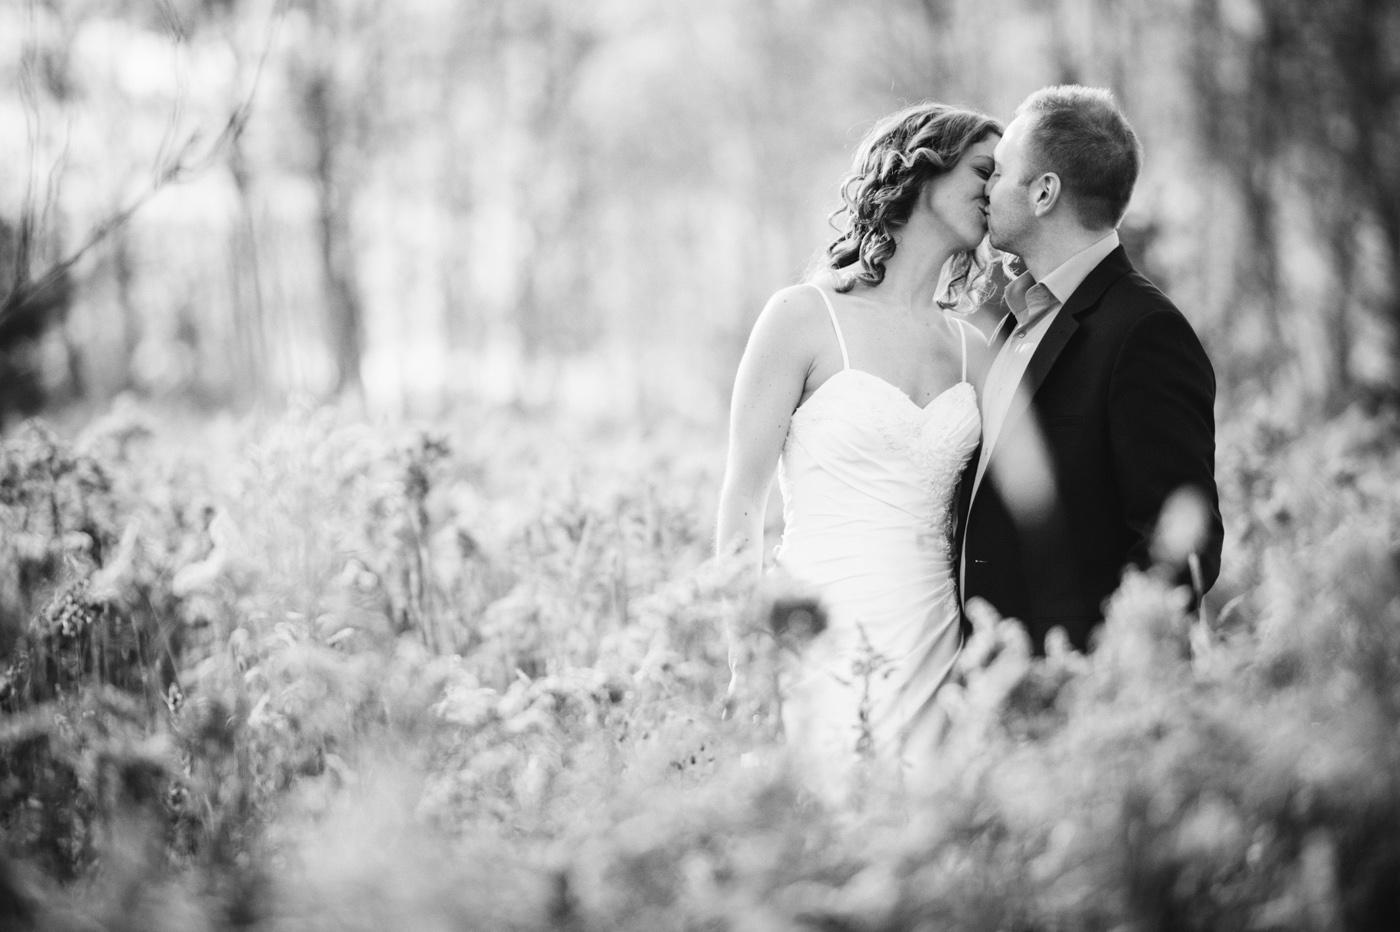 ss_weddingbest-28.jpg